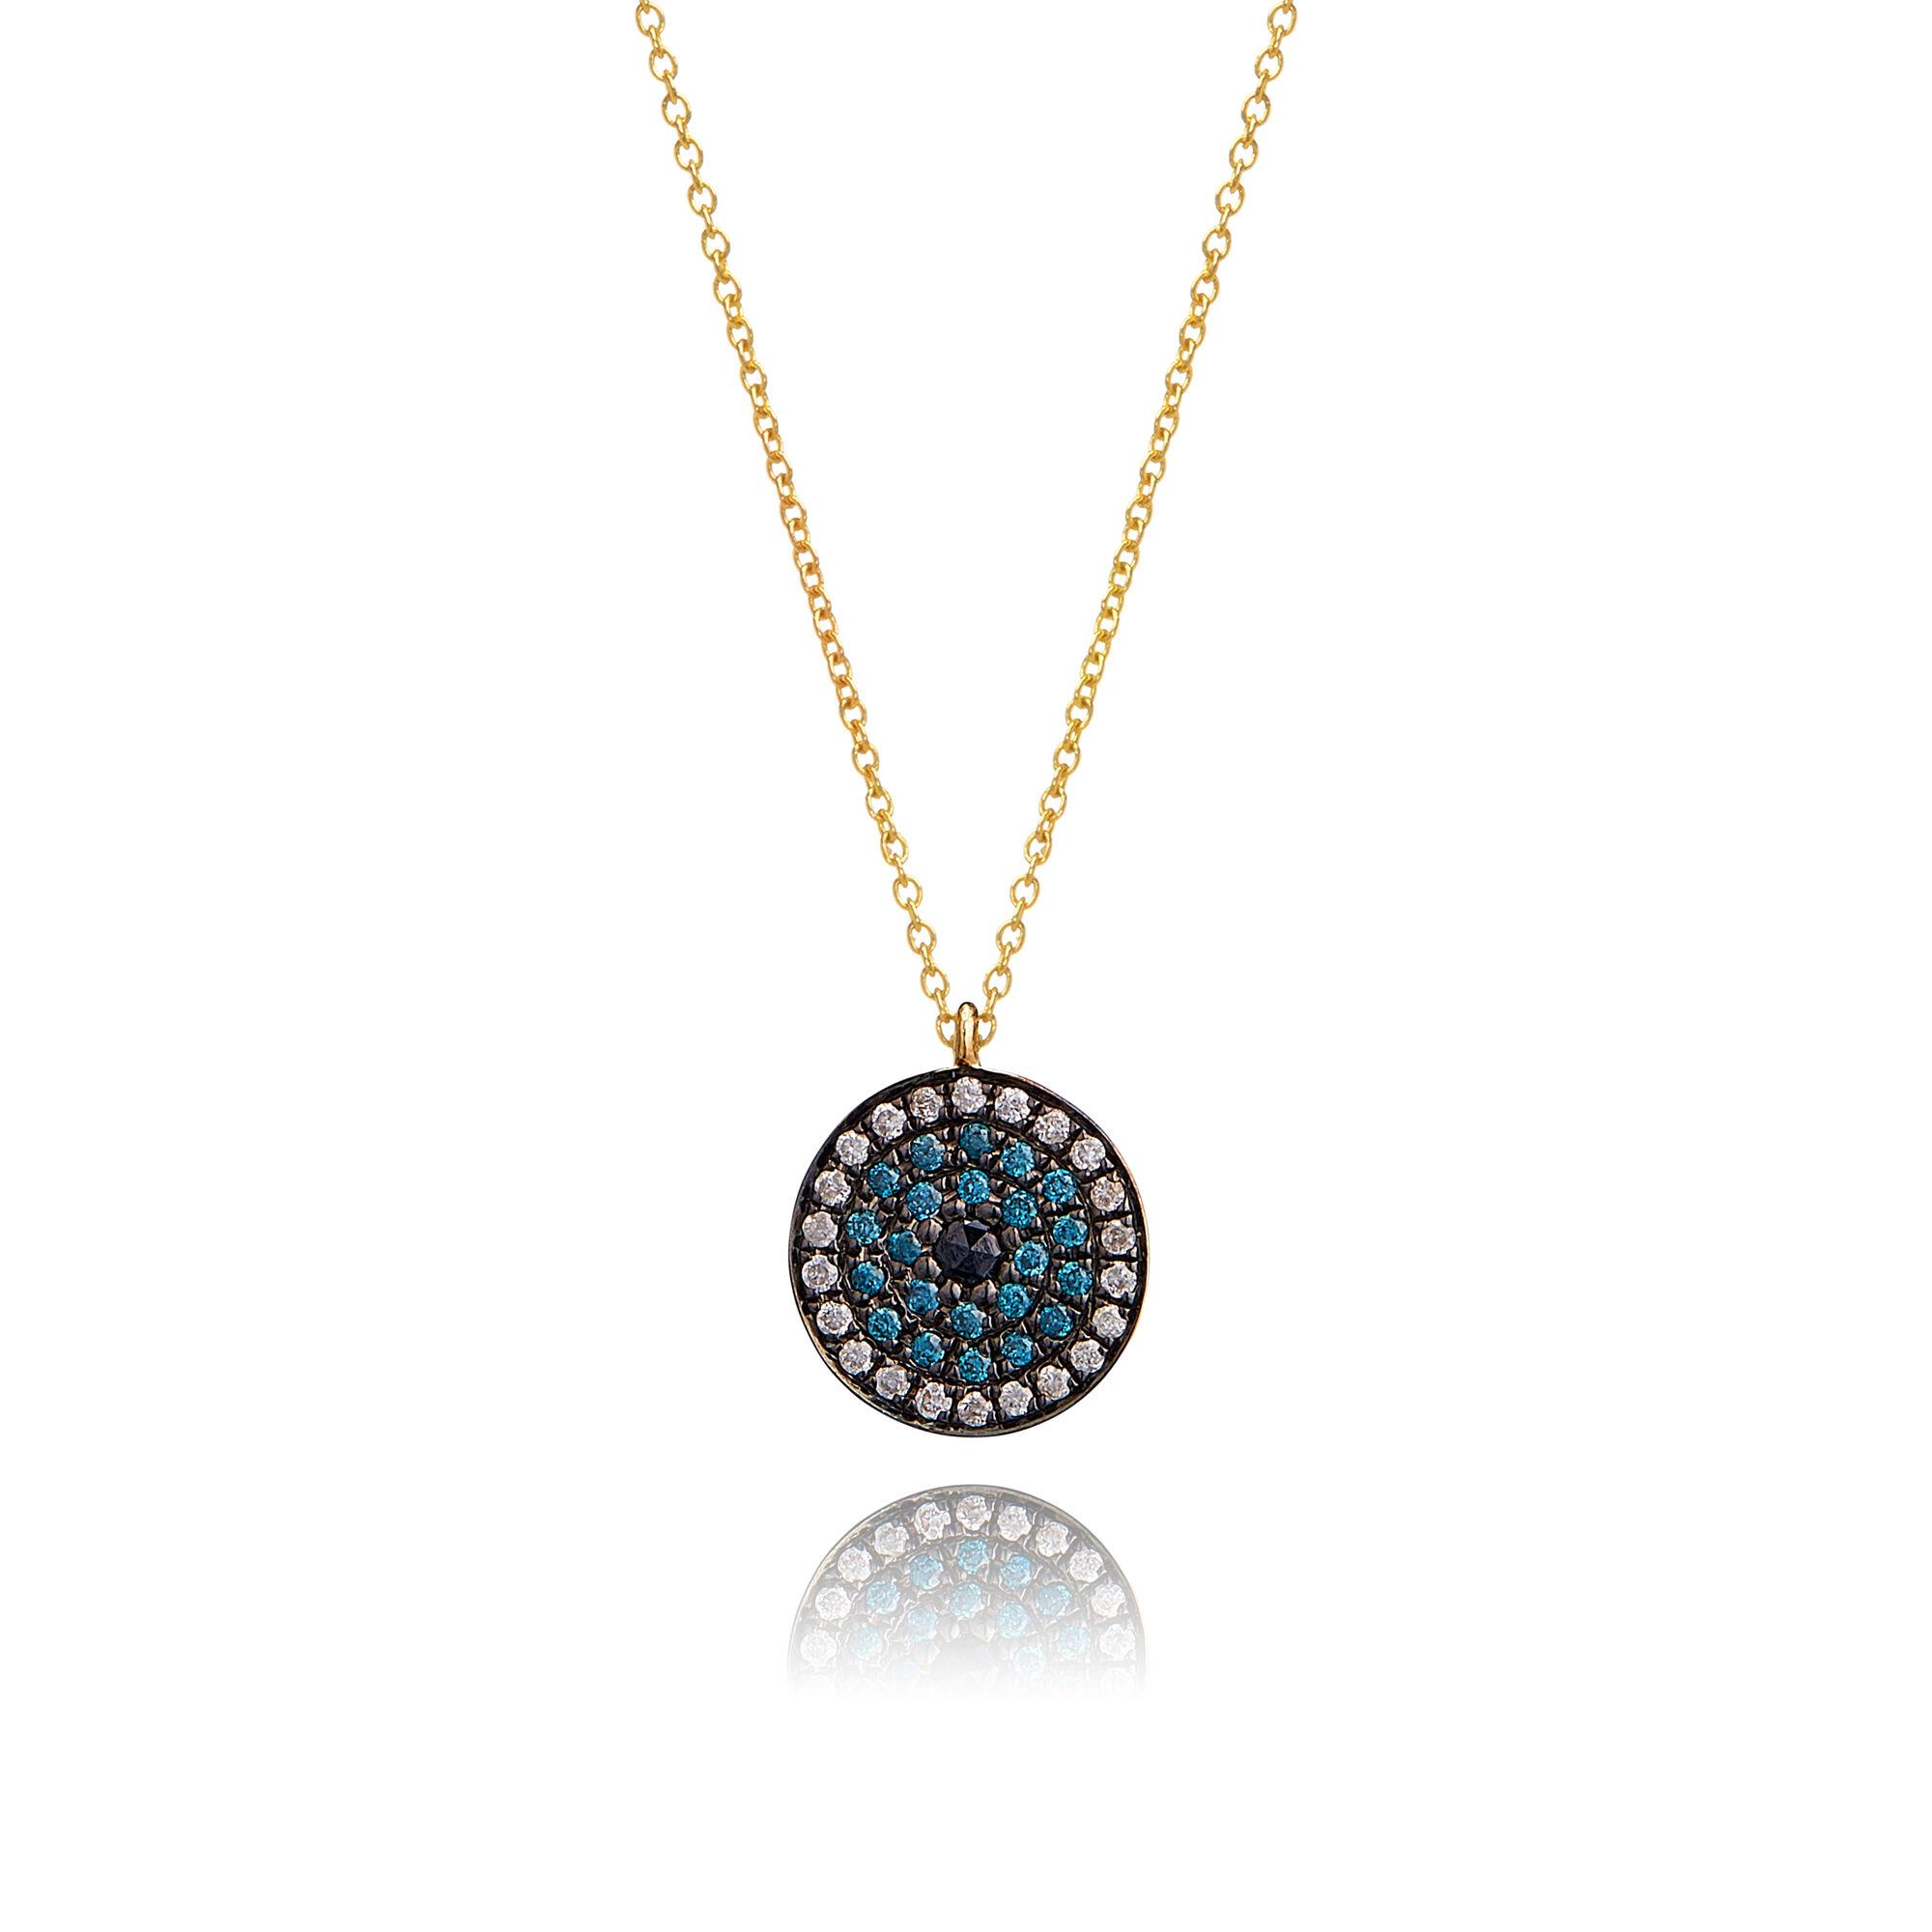 b86248cb48a9a Love Diamonds 18ct Gold Diamond Evil Eye Necklace